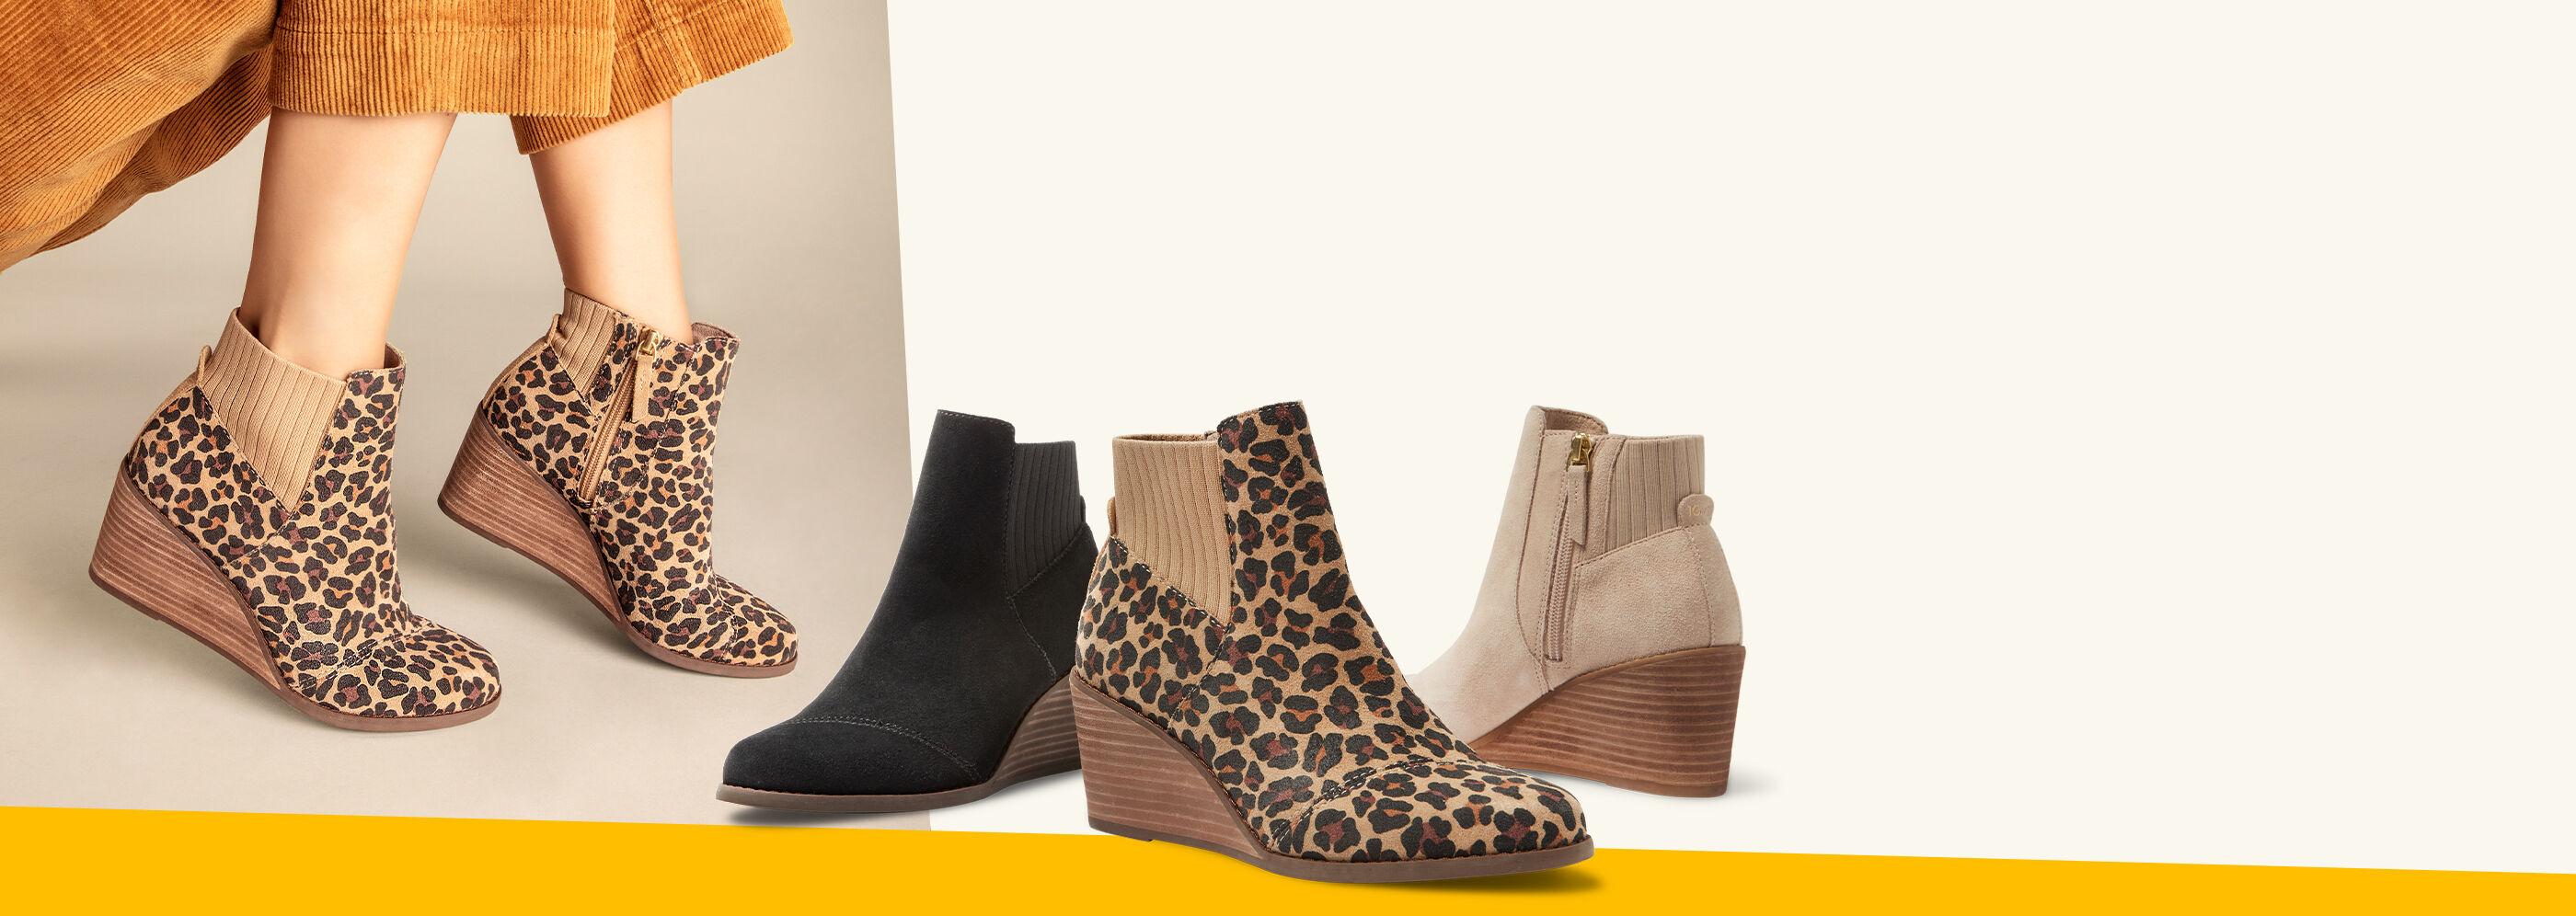 Women's Sadie Boot in various colors shown.